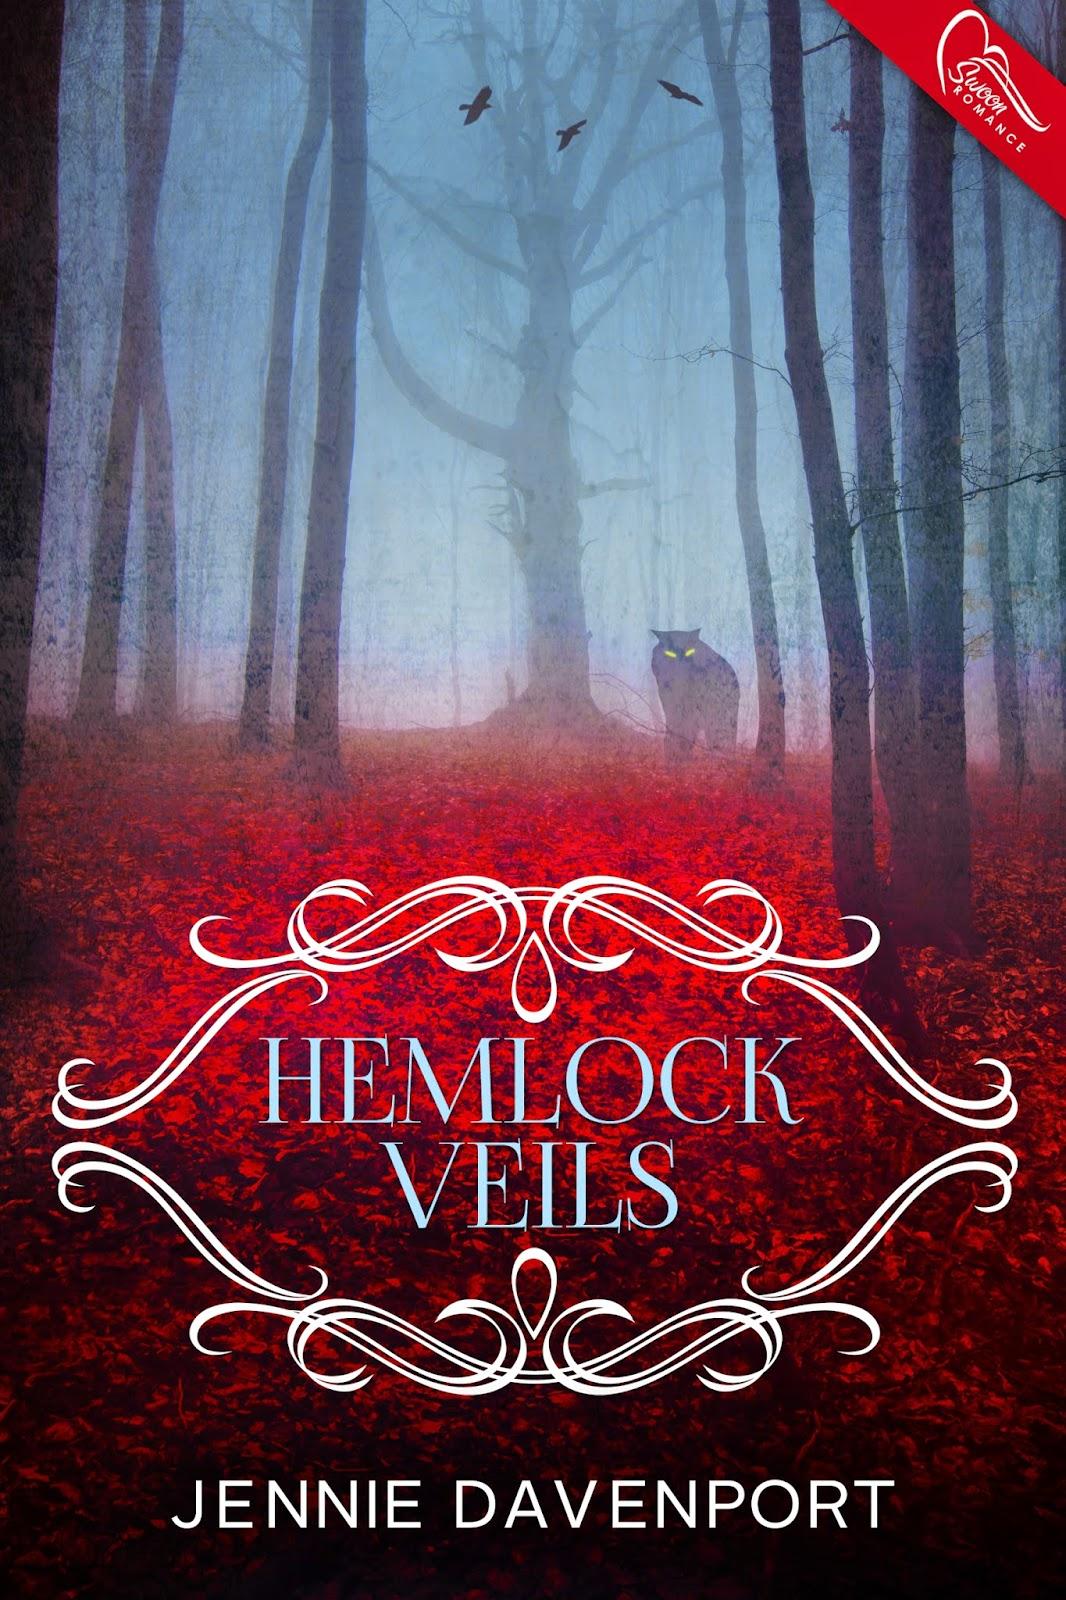 Hemlock Veils on Goodreads